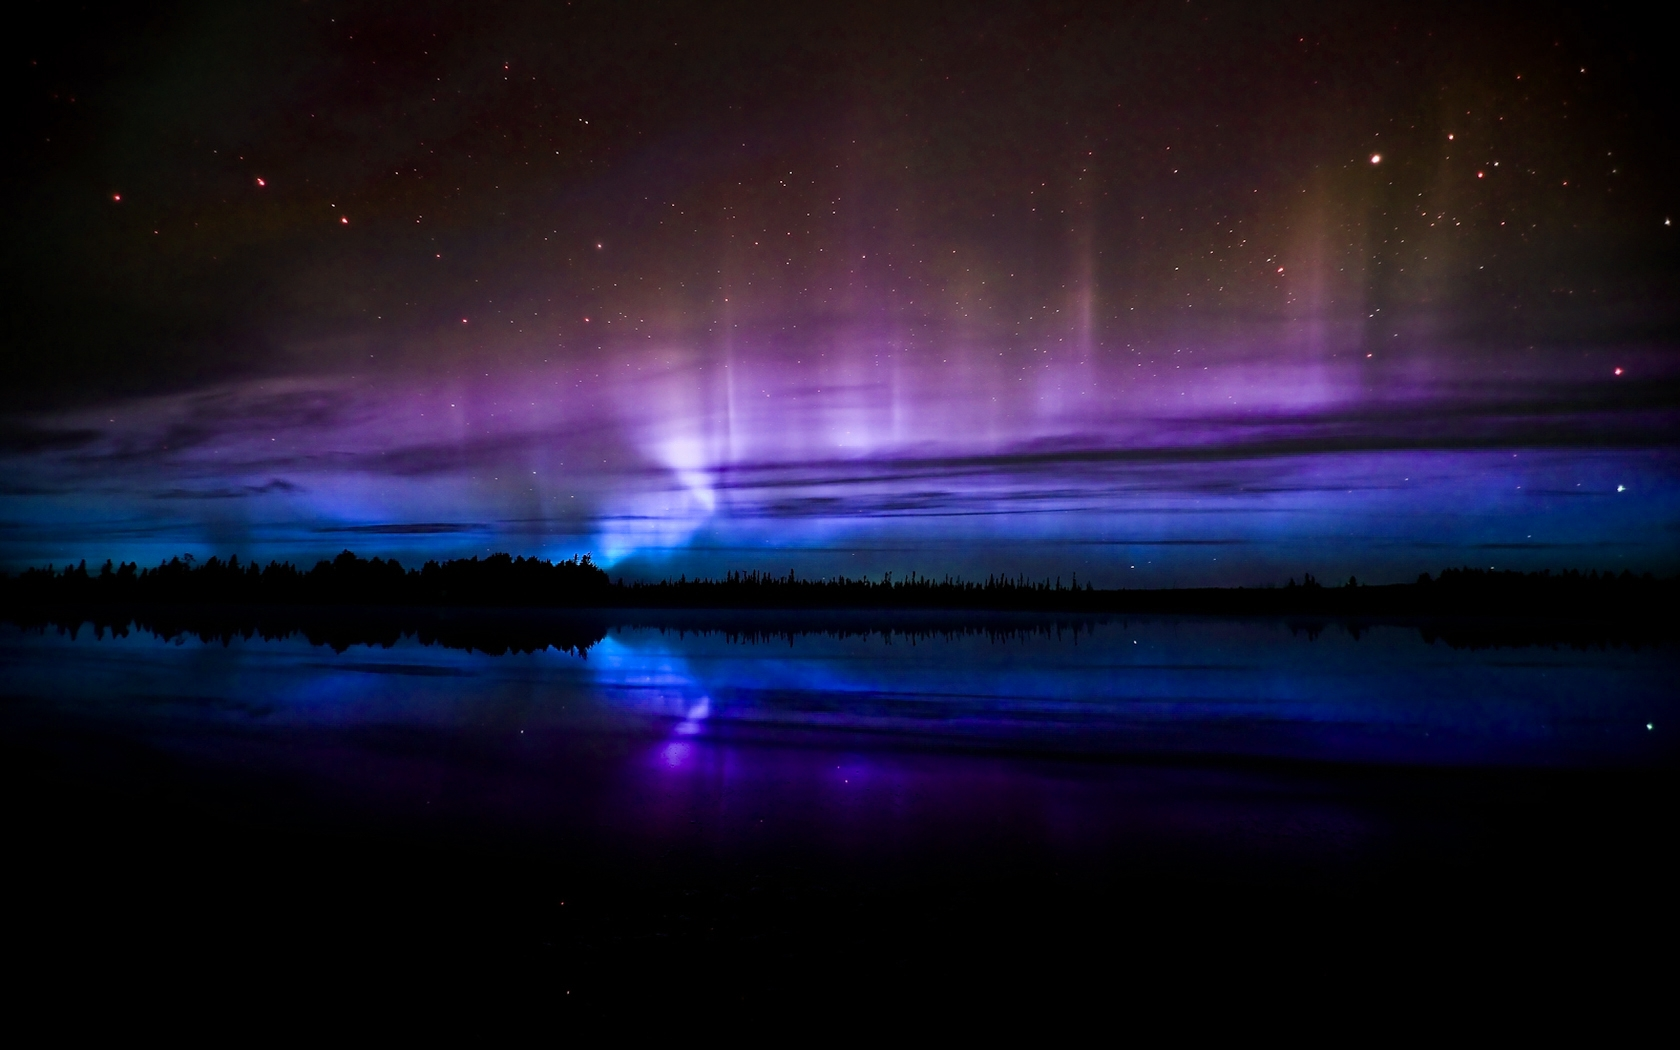 blue night sky background - photo #30